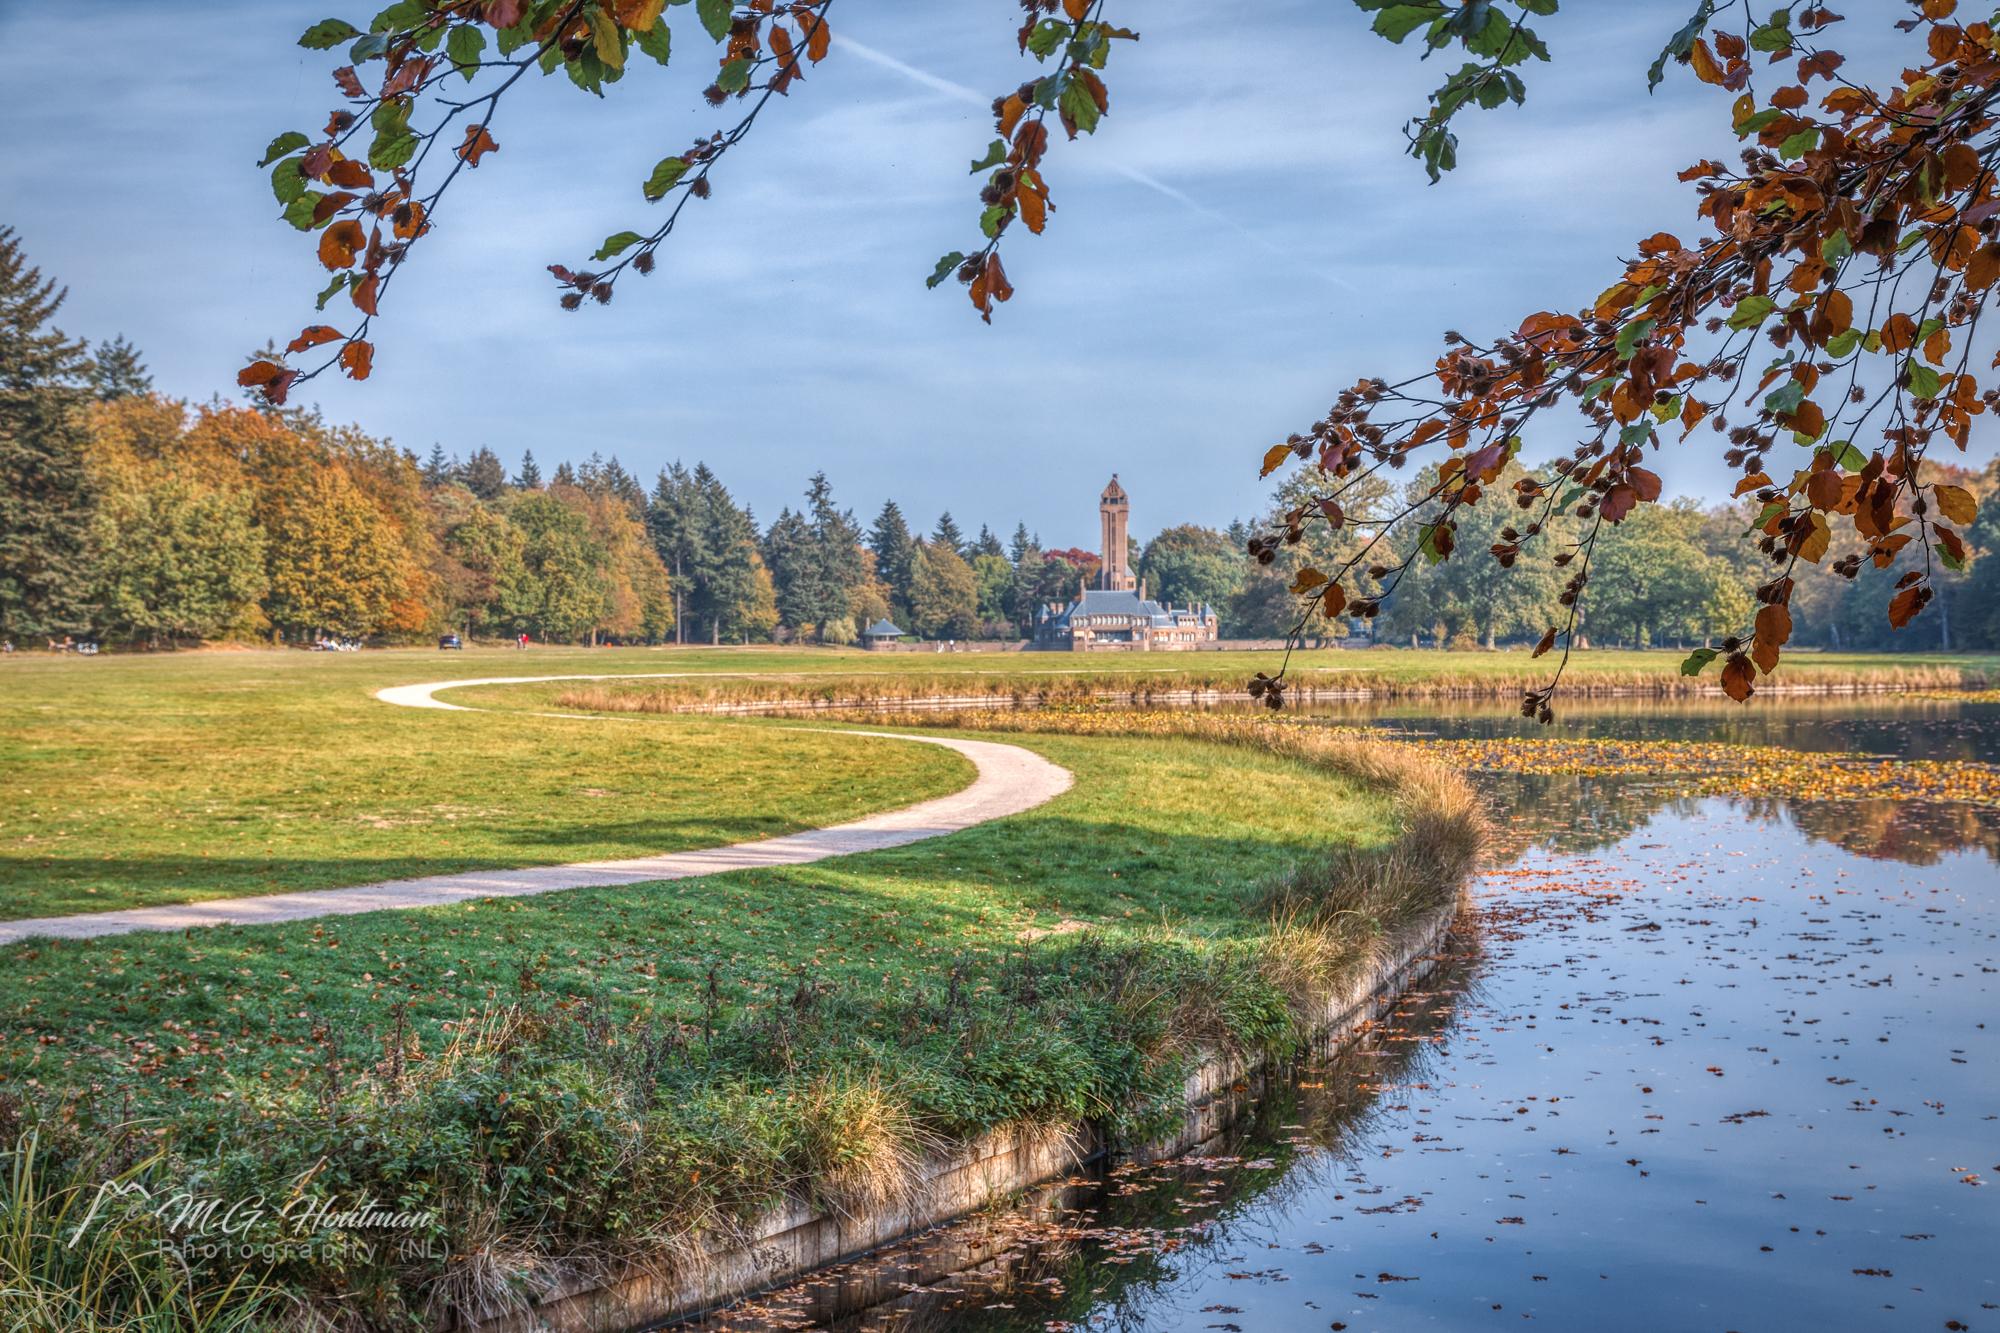 Jachthuis Sint Hubertus - Hoge Veluwe (NL)